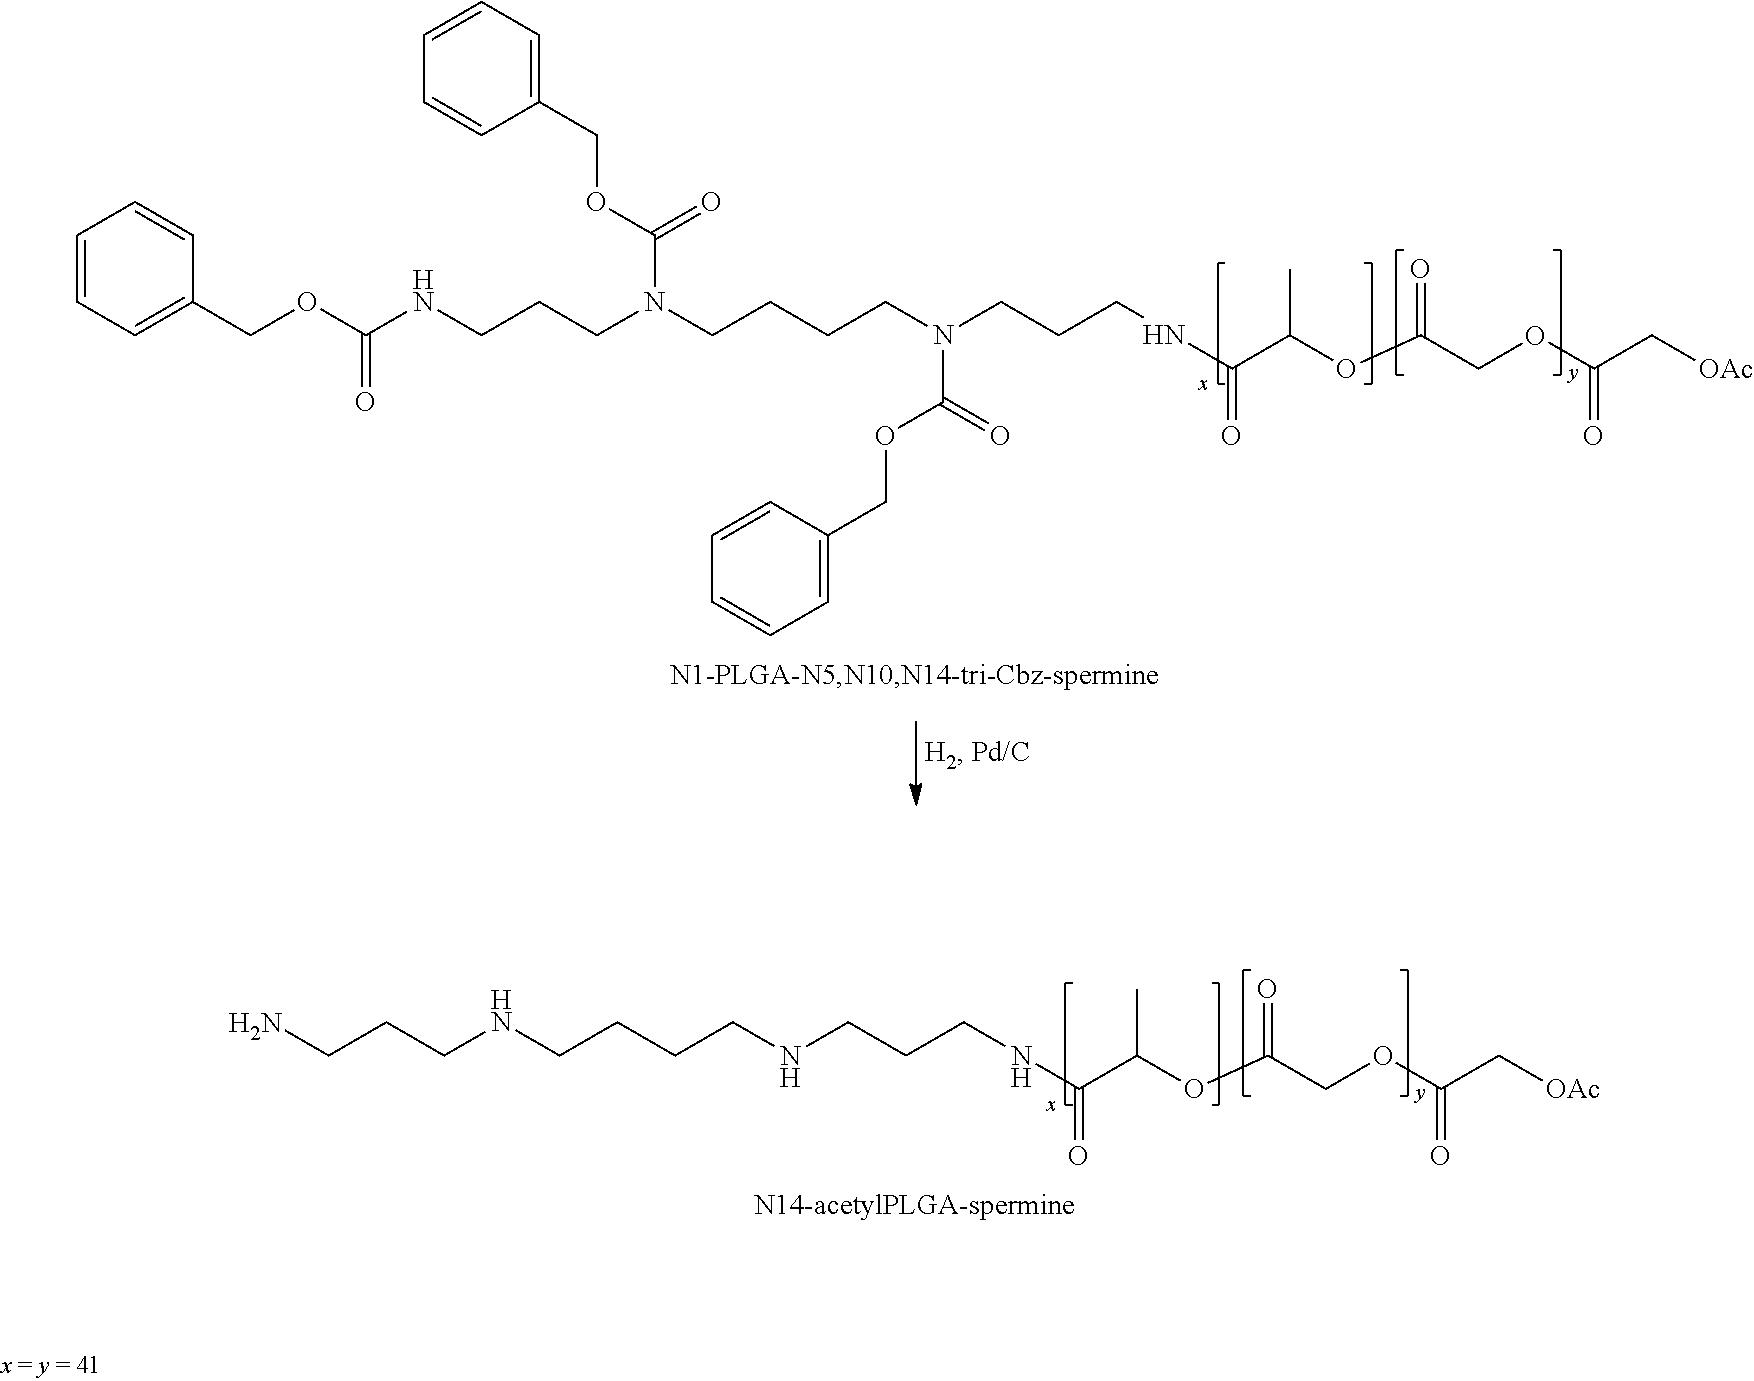 Sample Report Filter 14041 Patents Patentinspiration Original Hn Crystal 15 G